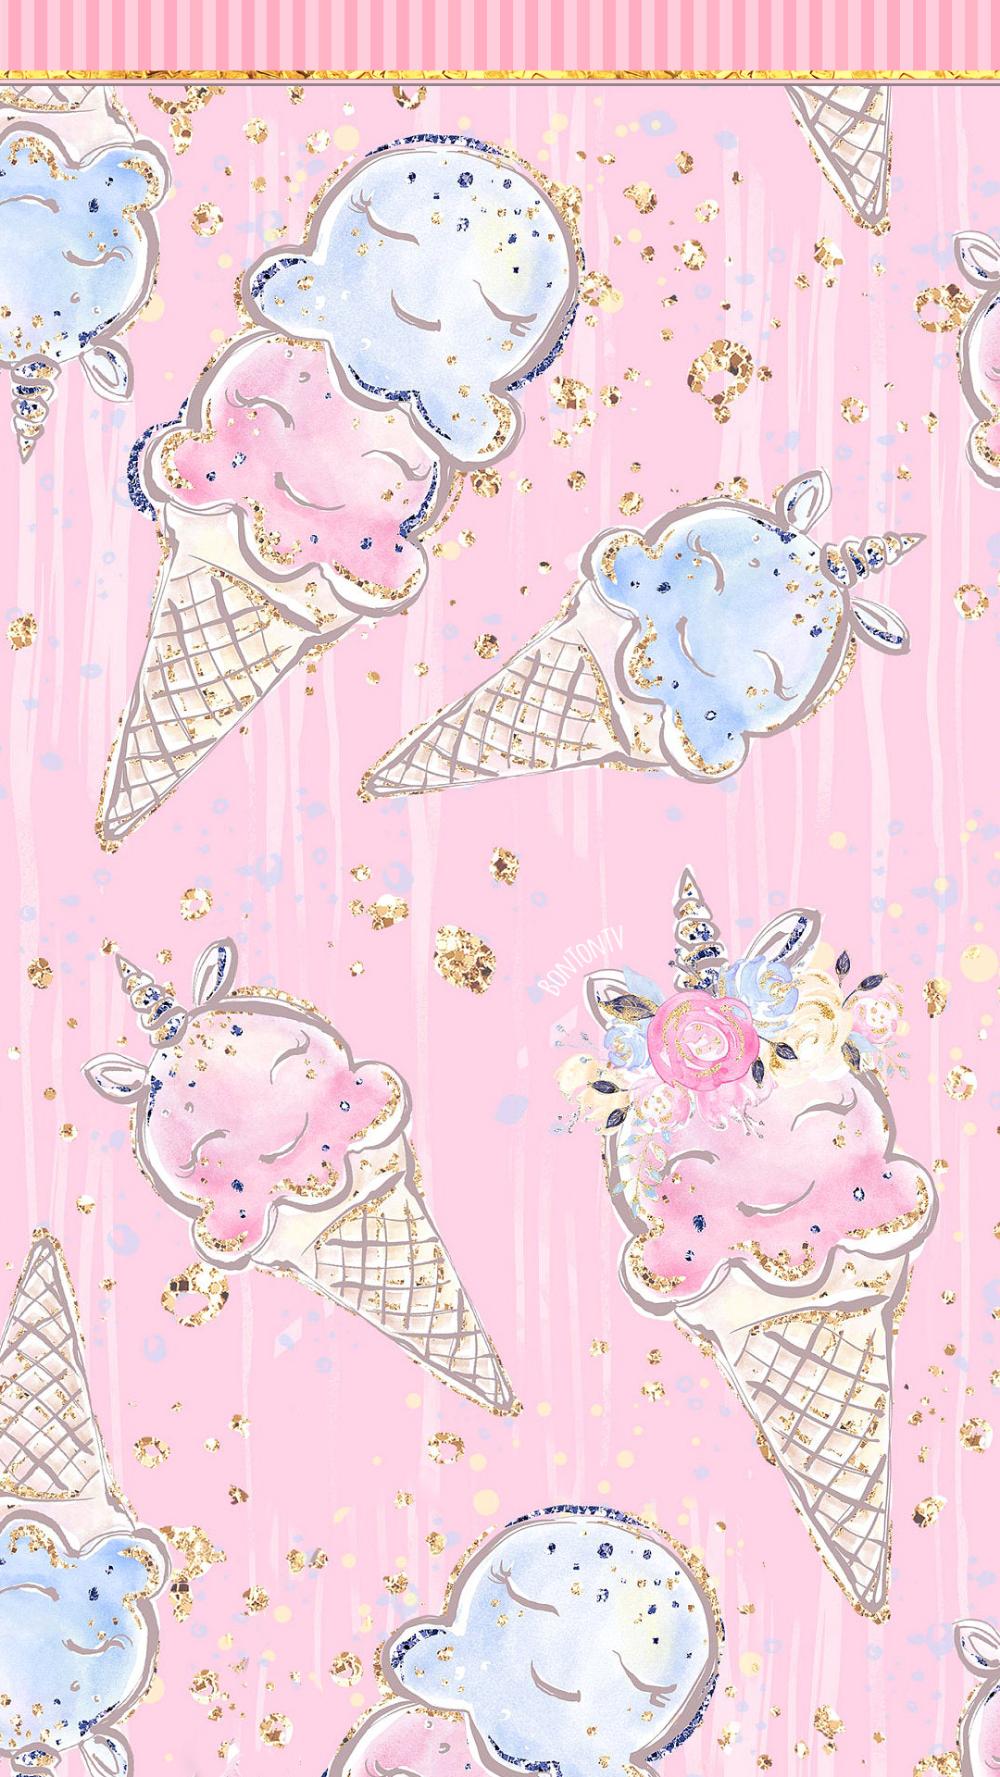 List of Latest Pink Phone Wallpaper HD 2020 by bontontv.com